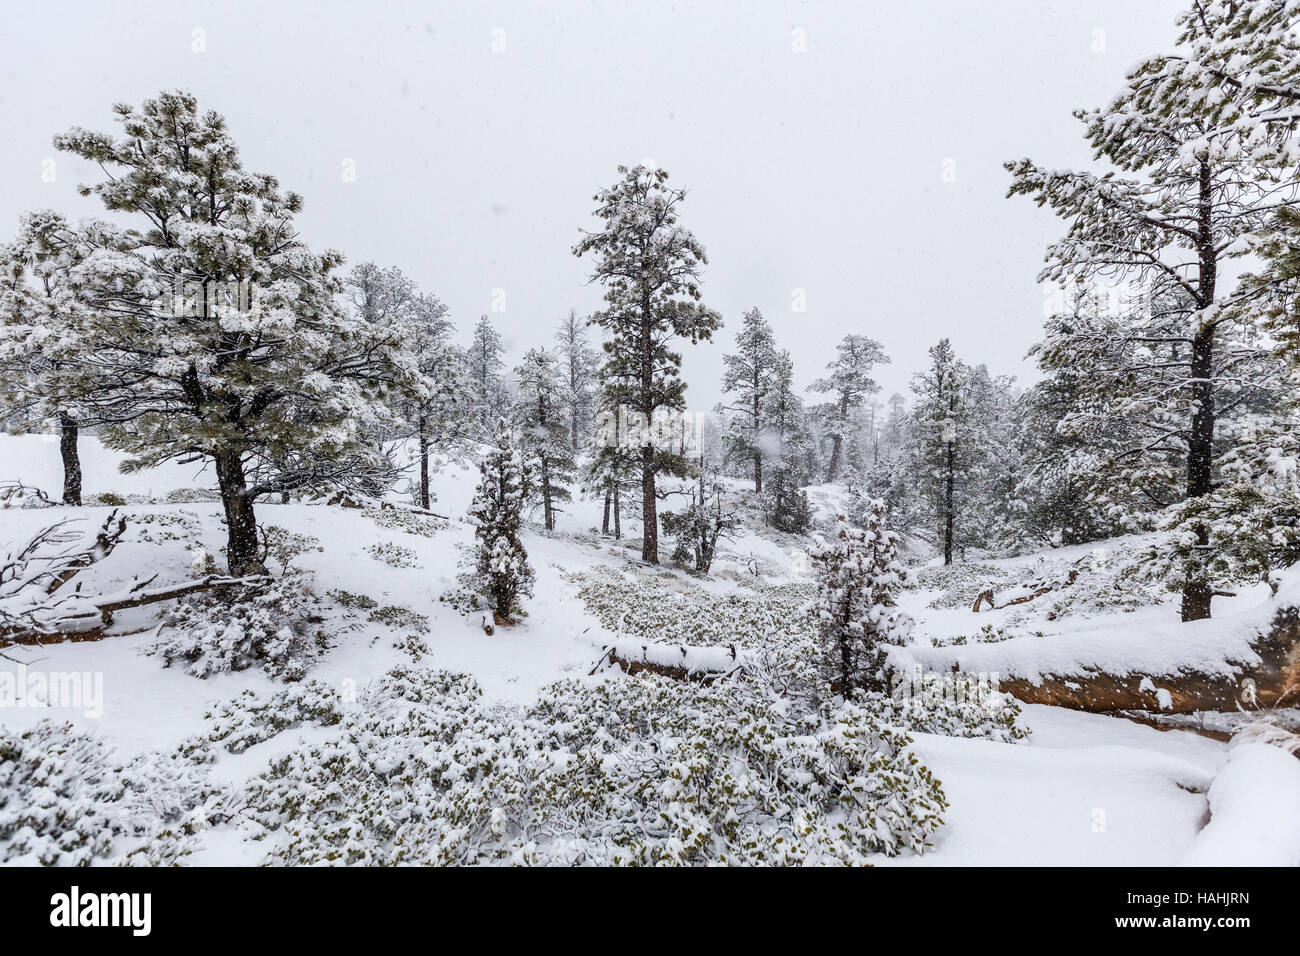 Heavy winter snowfall in progress at Bryce Canyon National Park. Stock Photo